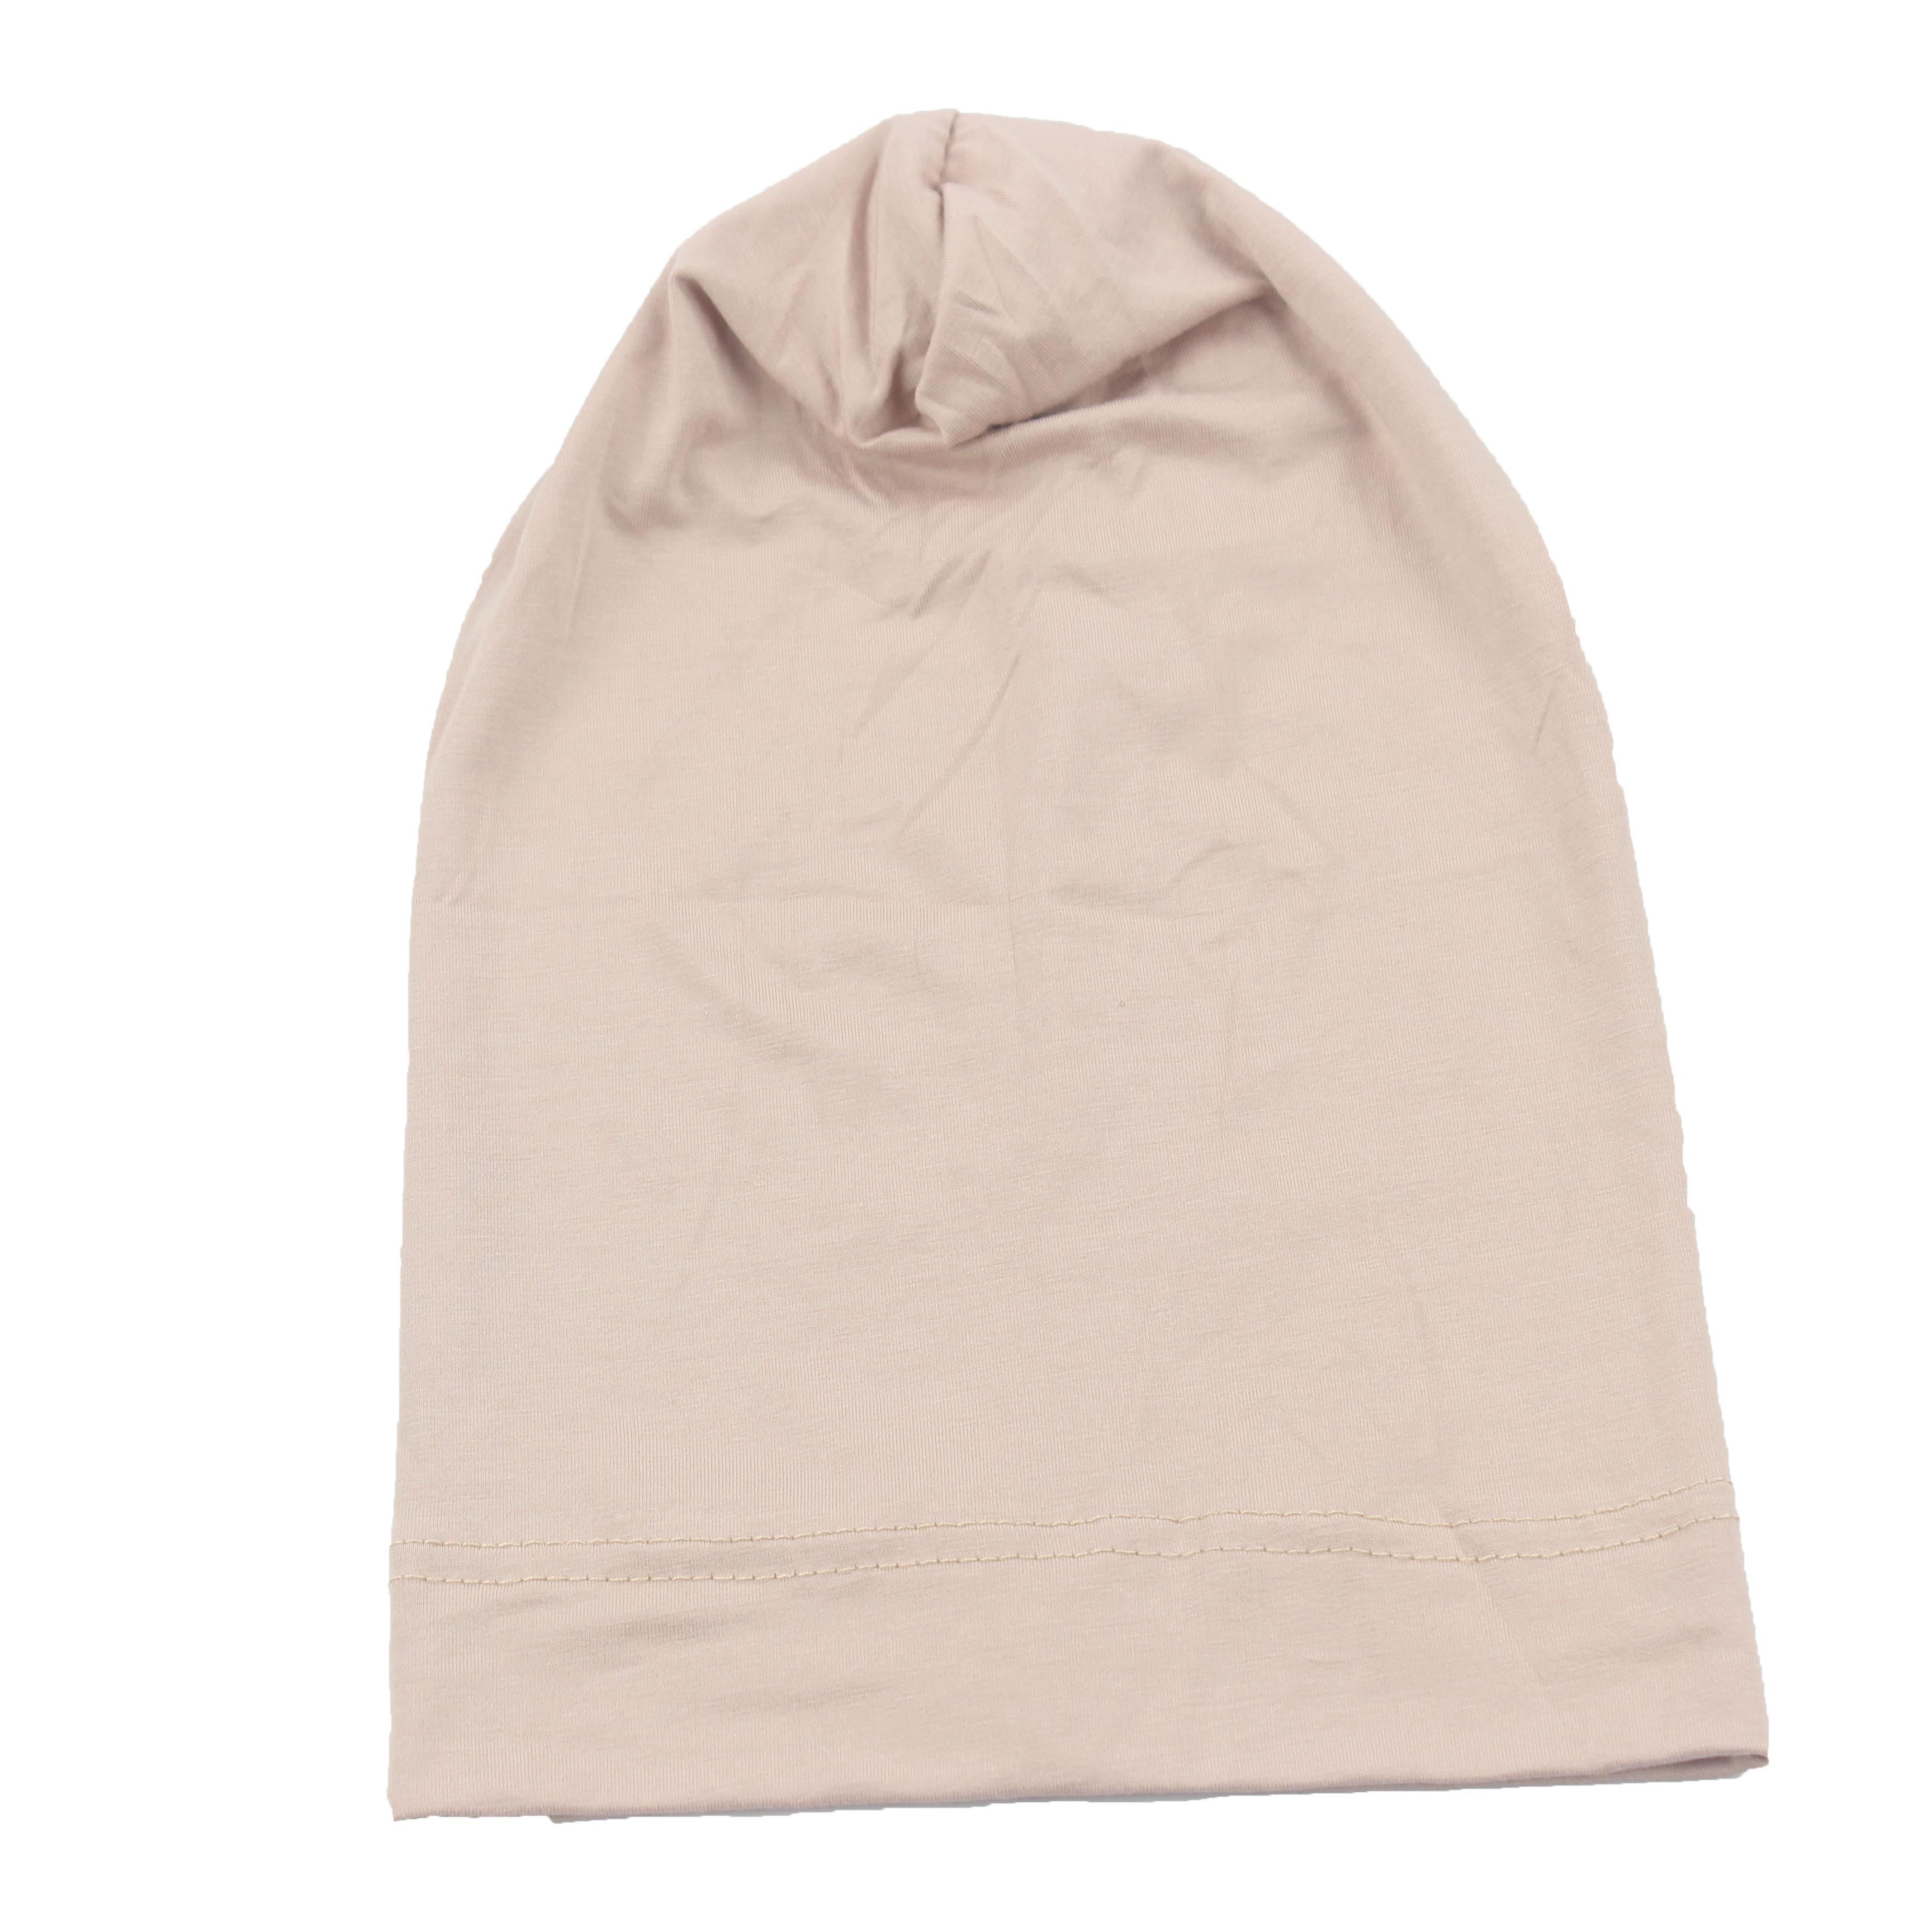 Image 2 - Muslim Women Girls Scarf Cap Cotton Breathable Hat Womens Turban  Elastic Cloth Head Cap Hat Ladies Hair Accessories WholesaleIslamic  Clothing